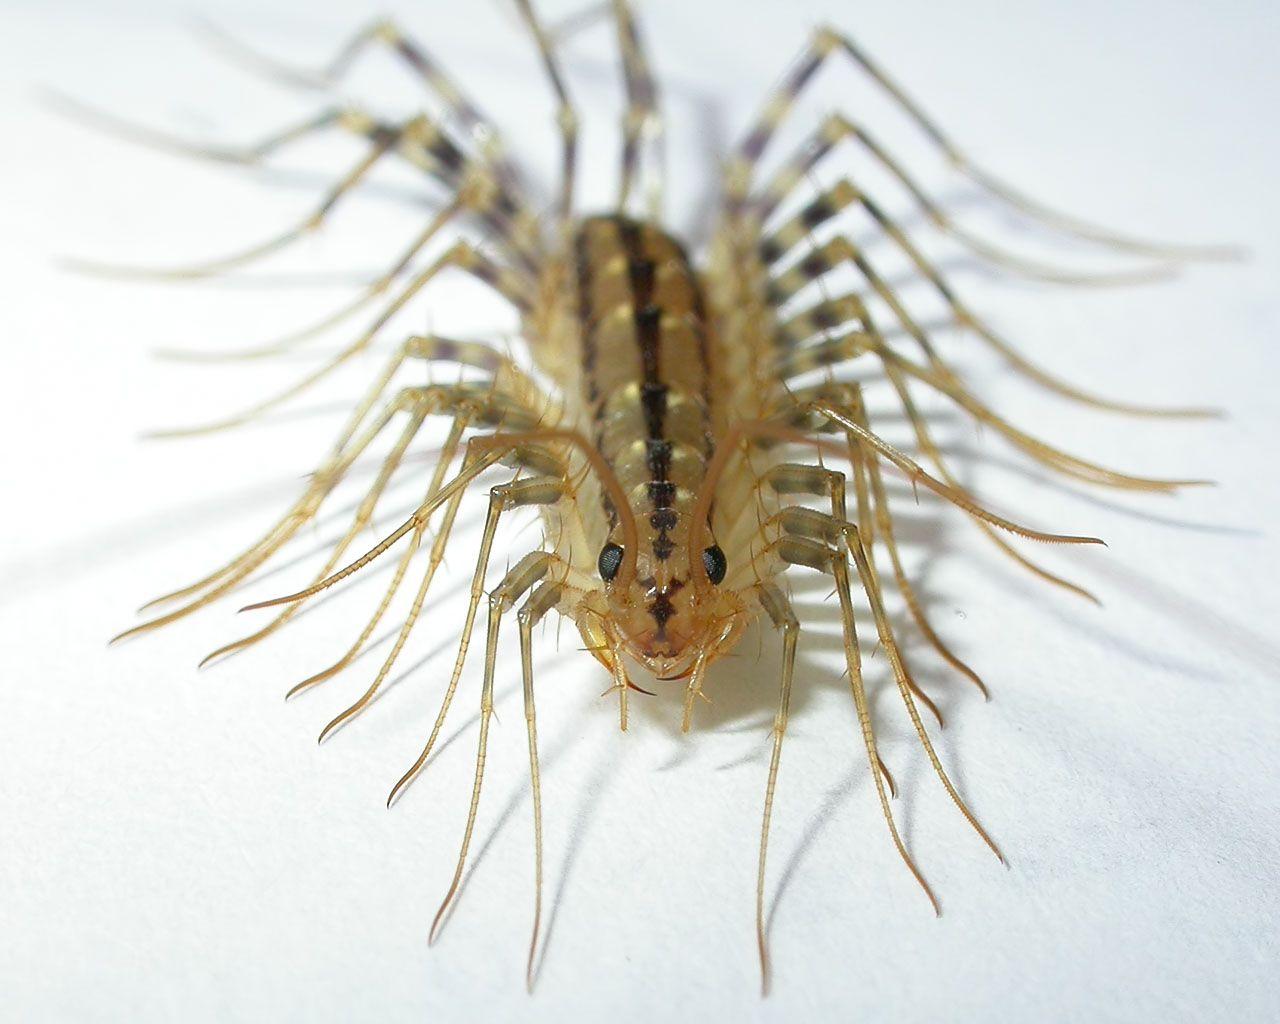 Pin On Chilopoda And Diplopoda